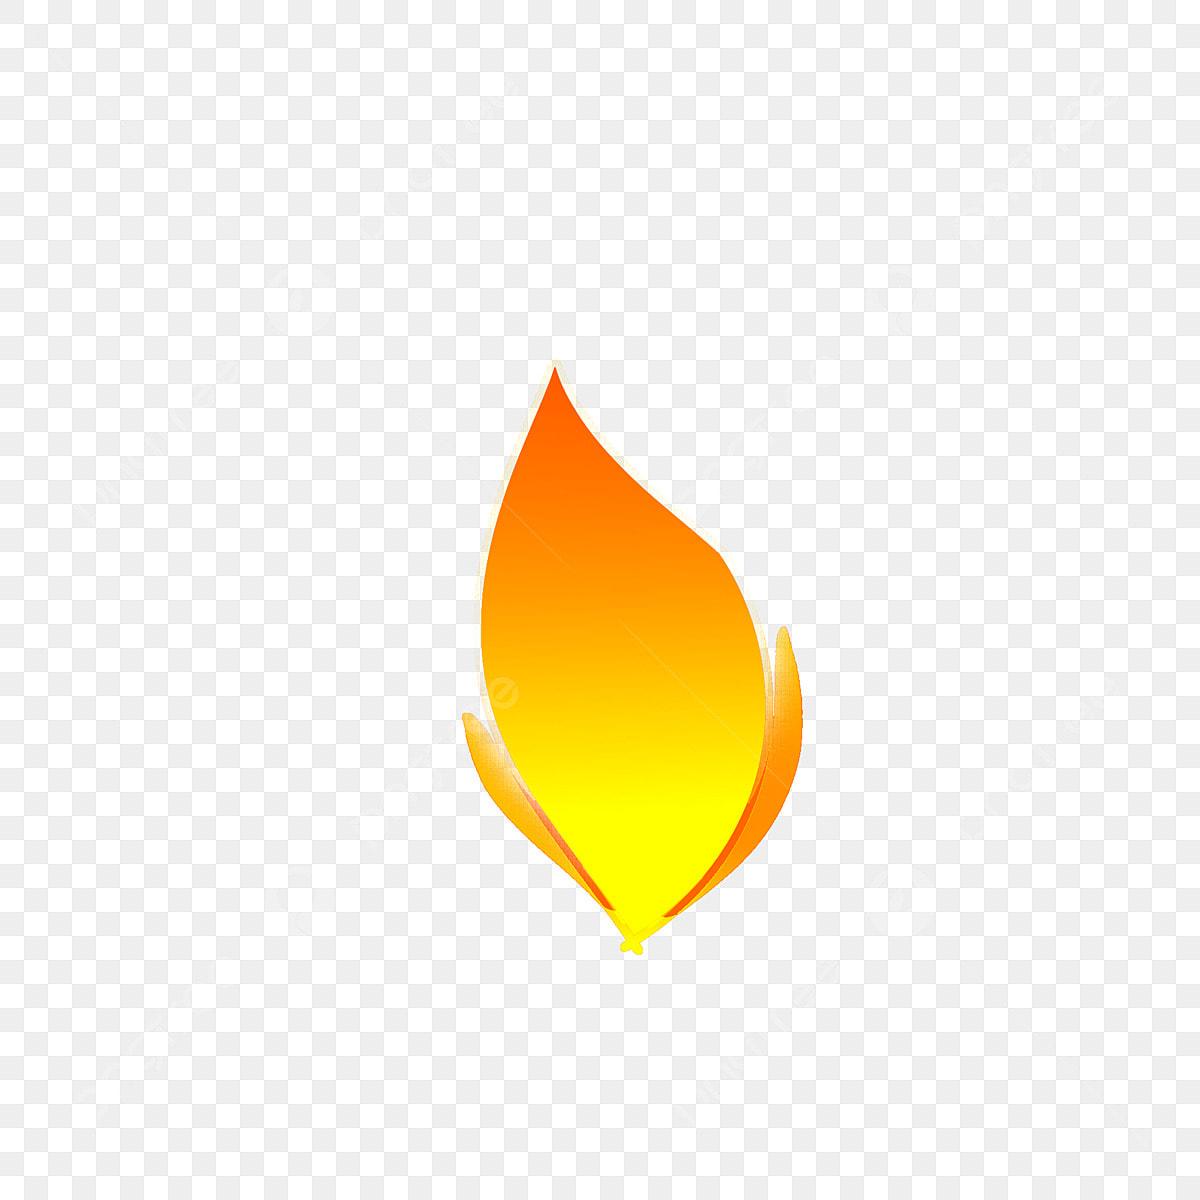 Die Flamme Der Kerze Die Flammen Material Png Png Und Psd